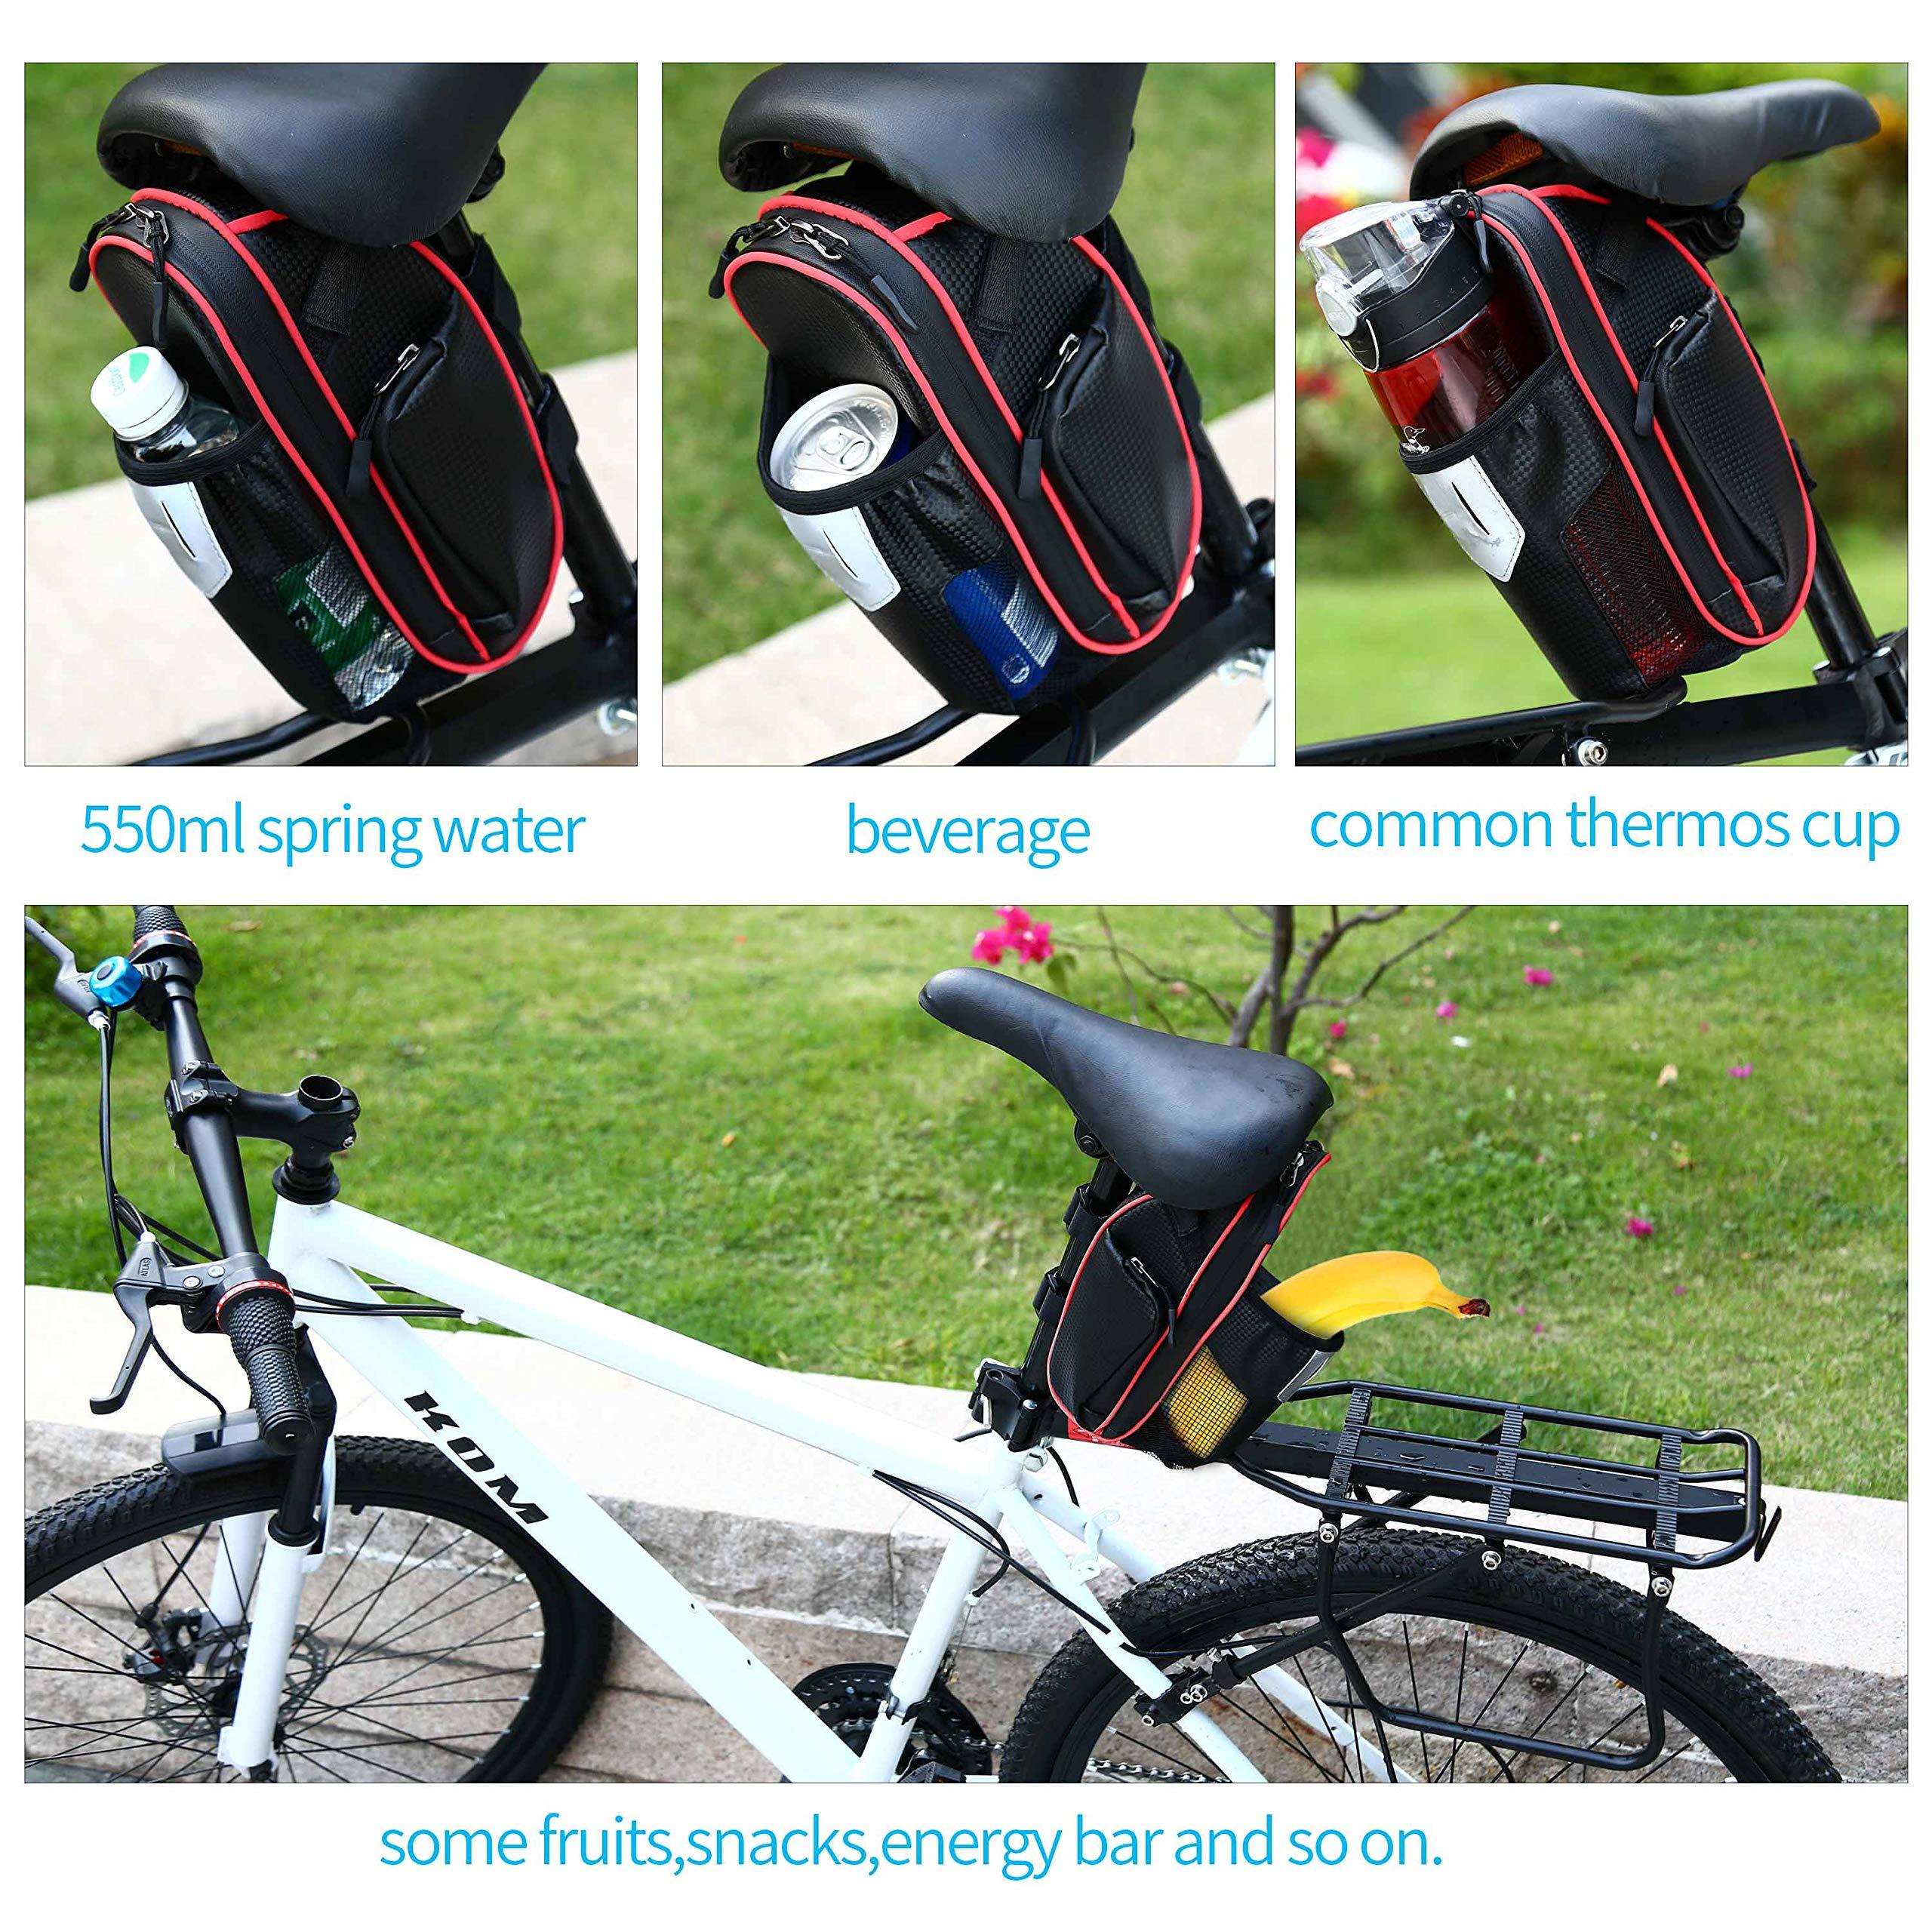 Selighting Bolsa de Sillin Bicicleta, Bolsa Bicicleta Montaña Alforja Bolsa Trasera Bicicleta Impermeable con Compartimento Botella (Rojo): Amazon.es: Deportes y aire libre